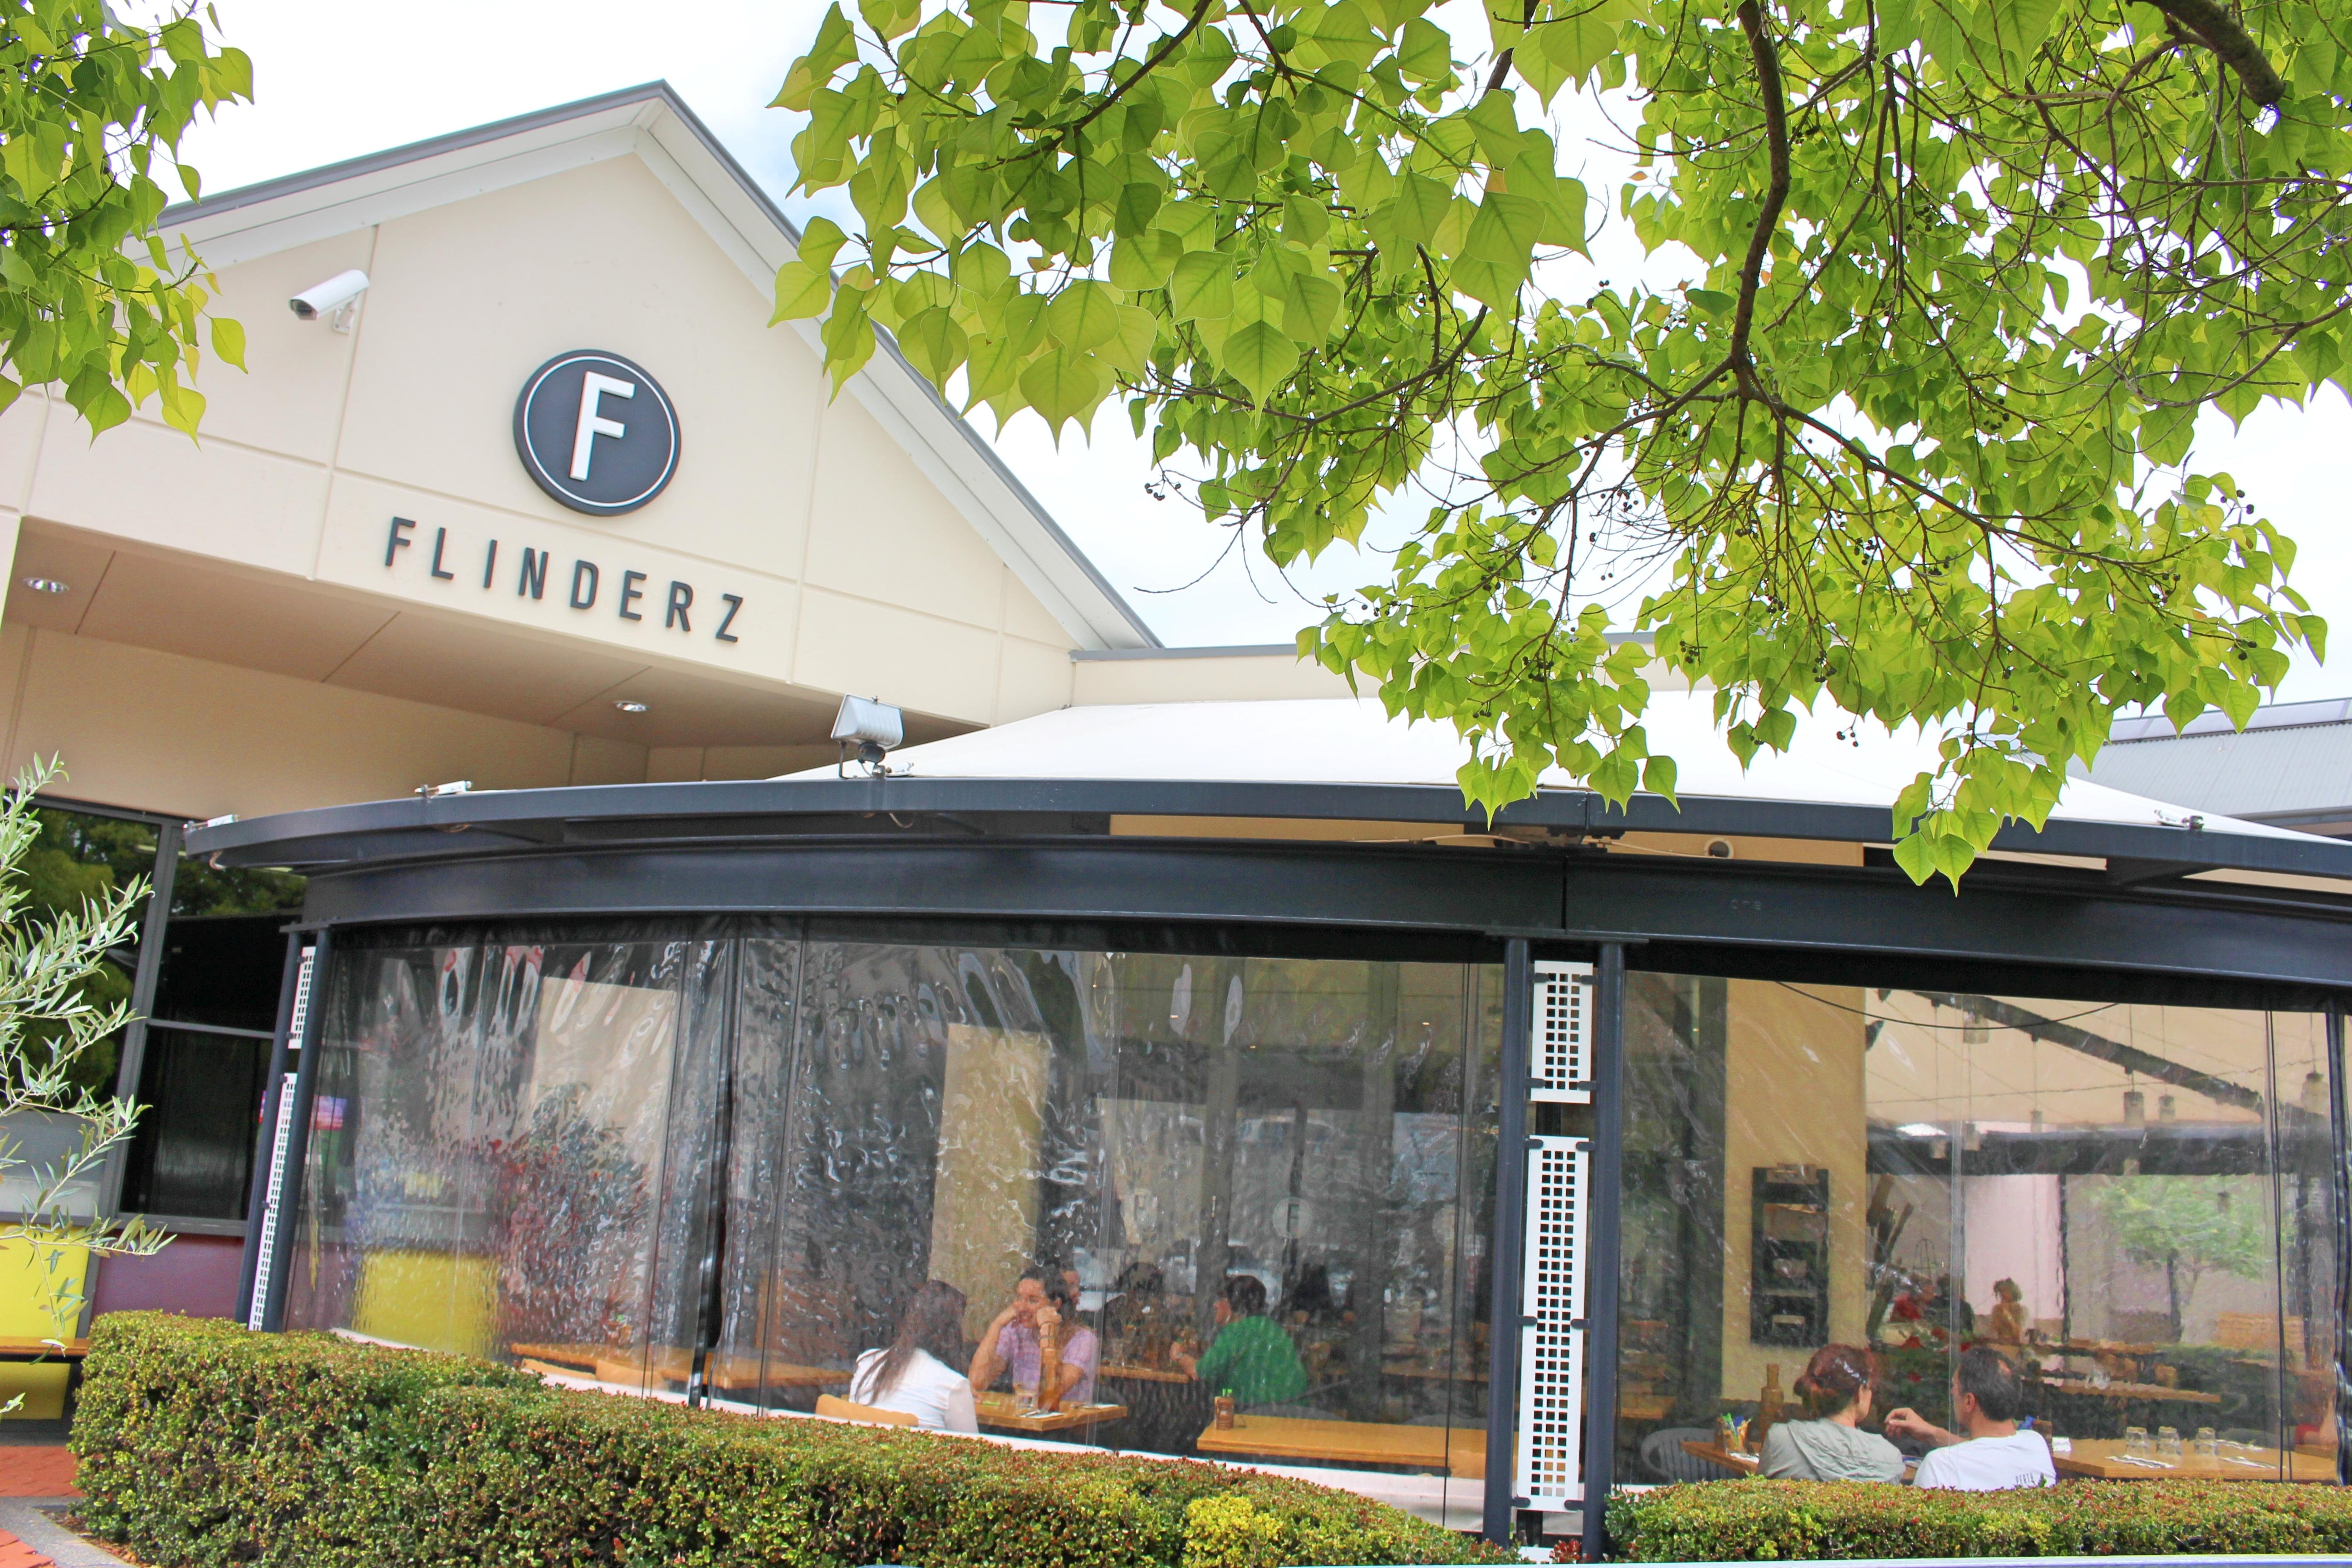 Flinders Cafe Hillarys Menu